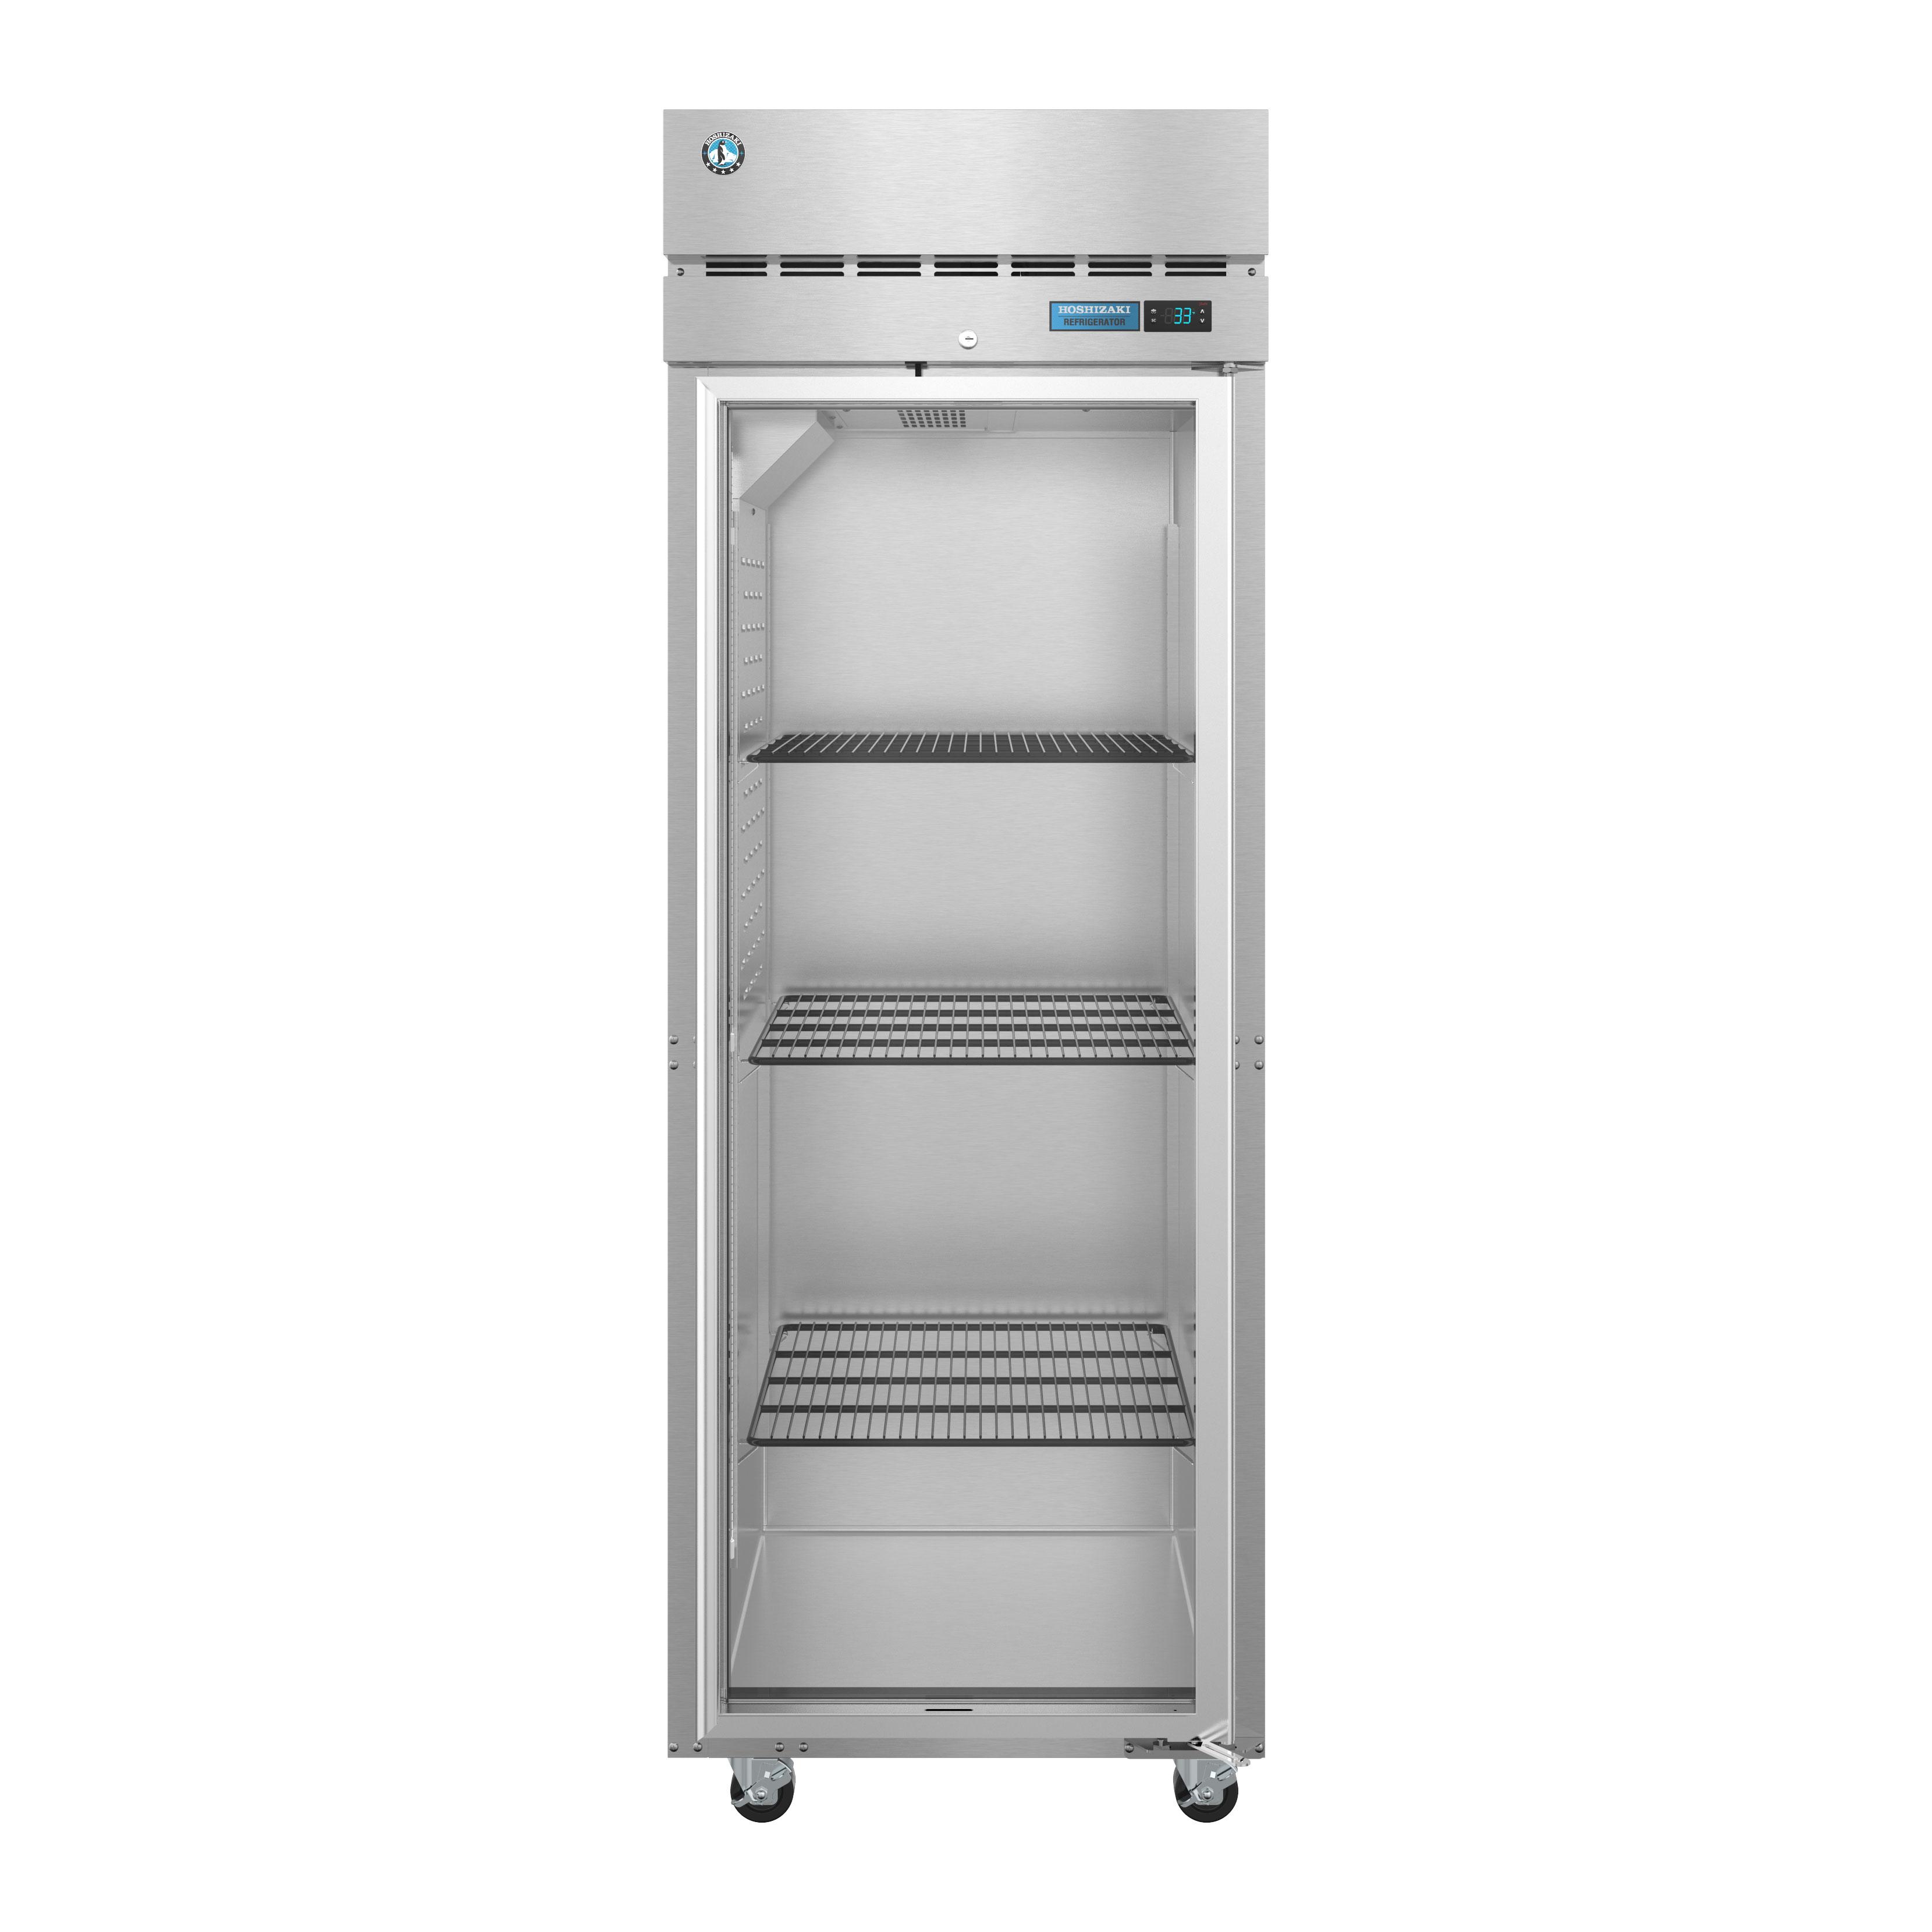 Hoshizaki F1A-FG reach-in refrigerators & freezers